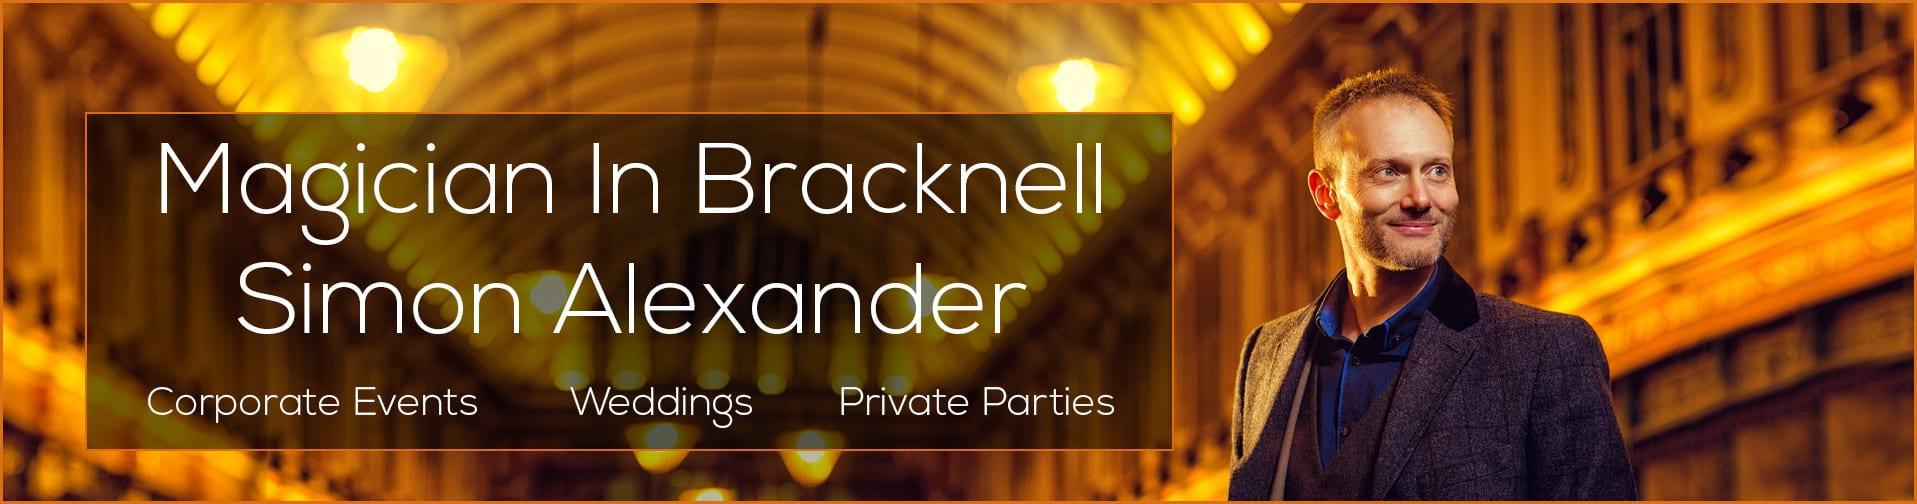 Magician in Bracknell